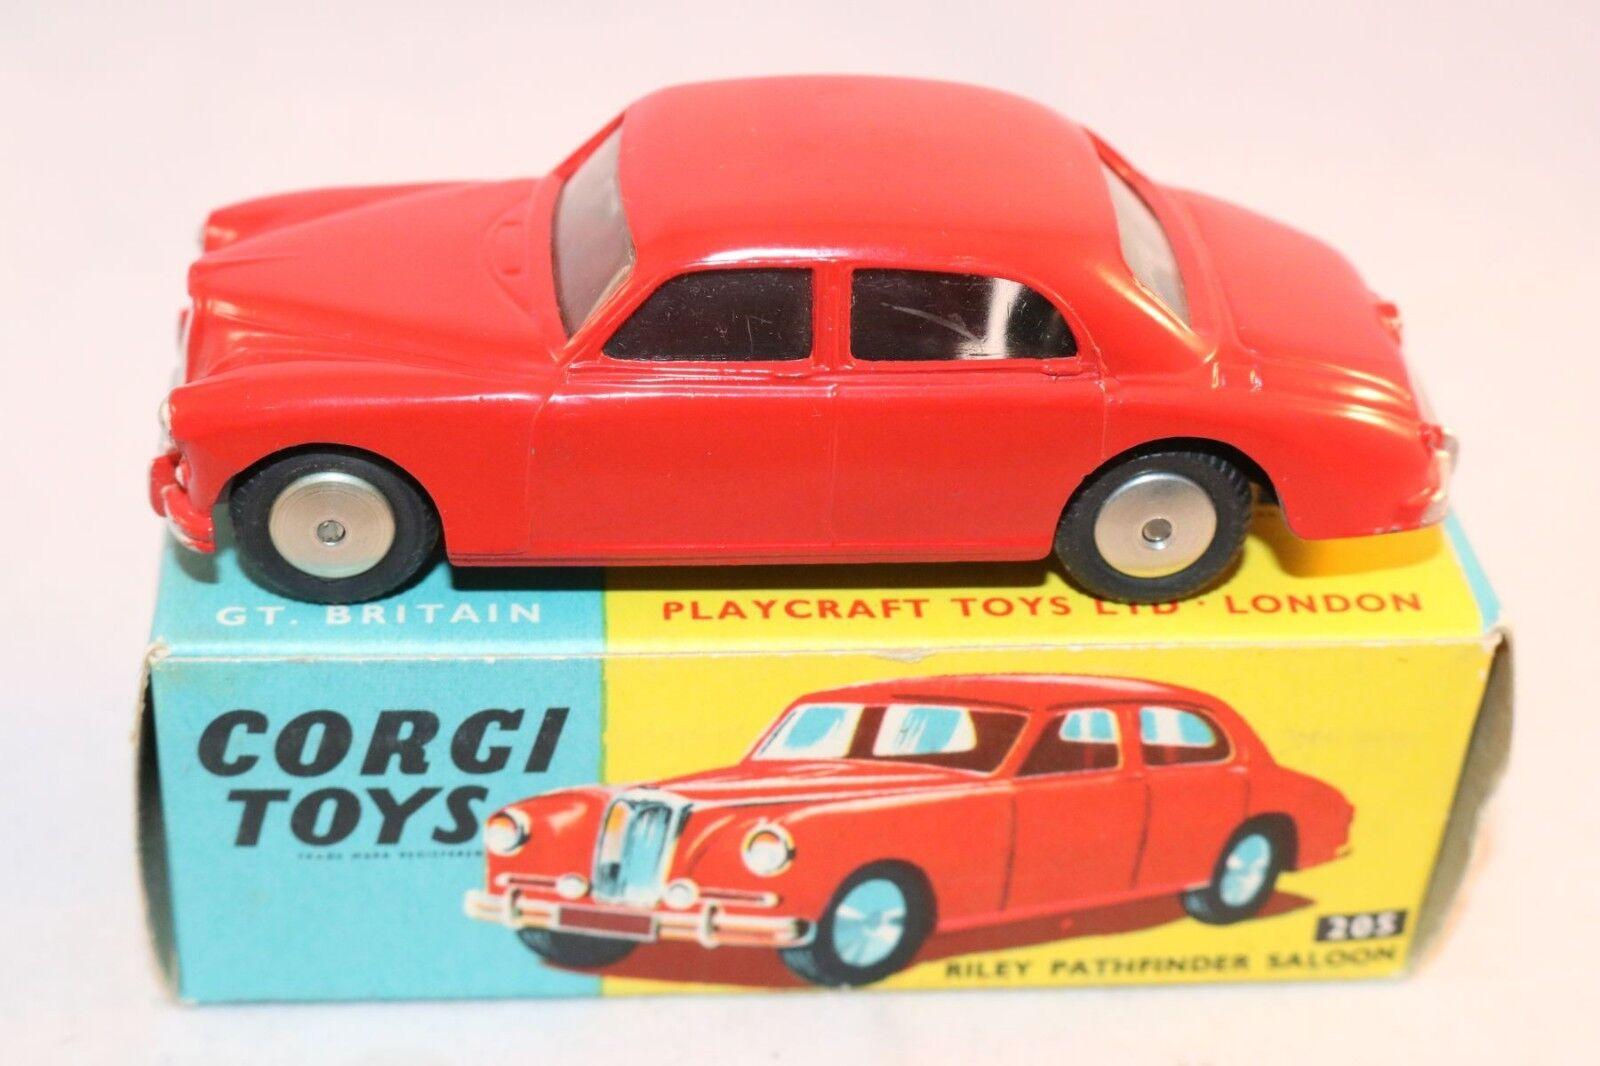 Corgi Toys 205 Riley Pathfinder very near mint in a super box a beauty